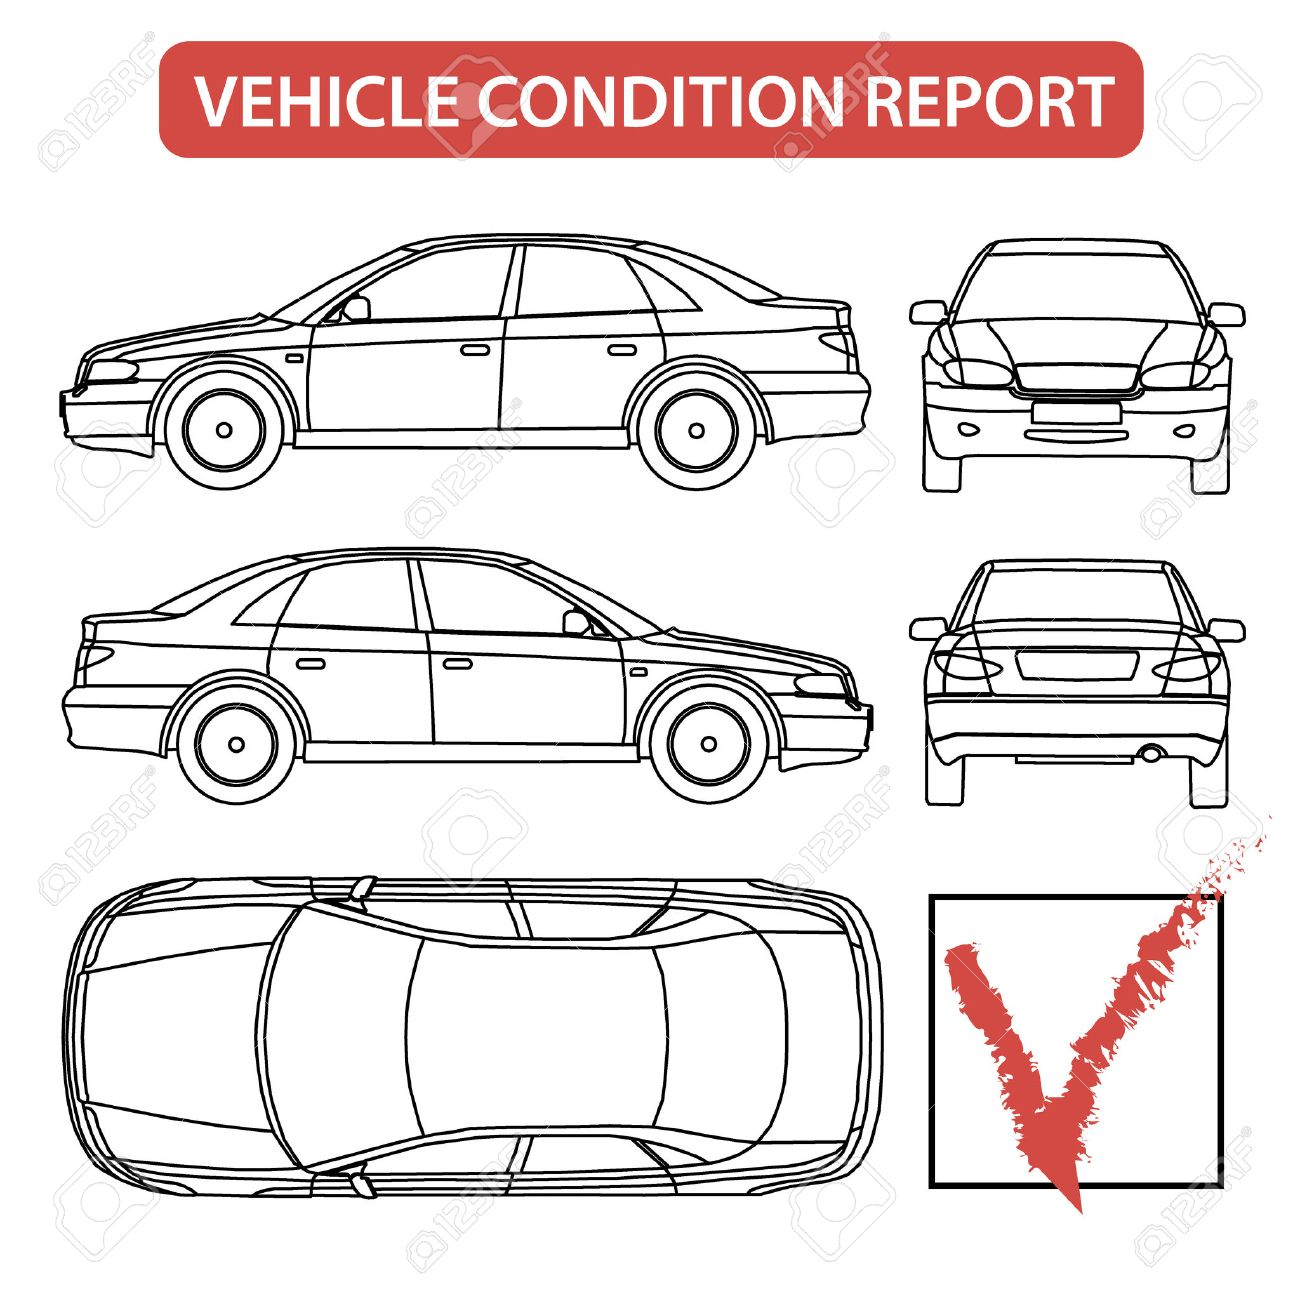 Car Condition Report Car Checklist Auto Damage Inspection Vector